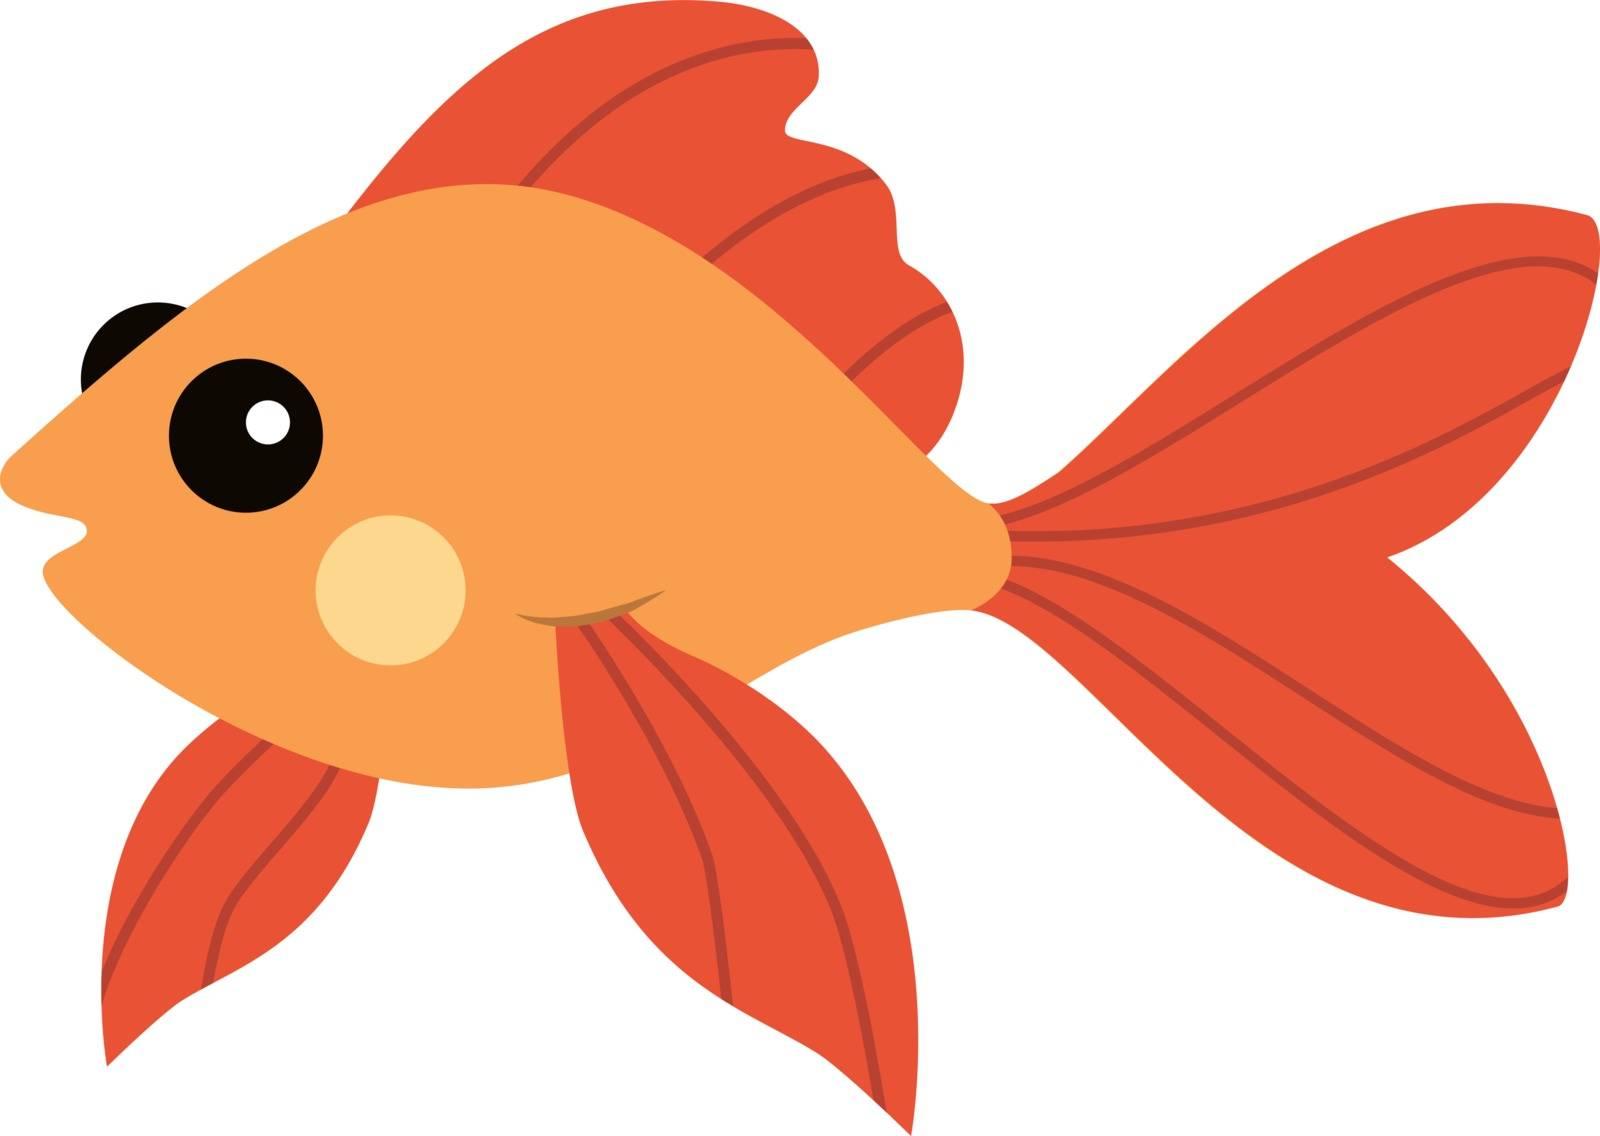 Golden fish, illustration, vector on white background.